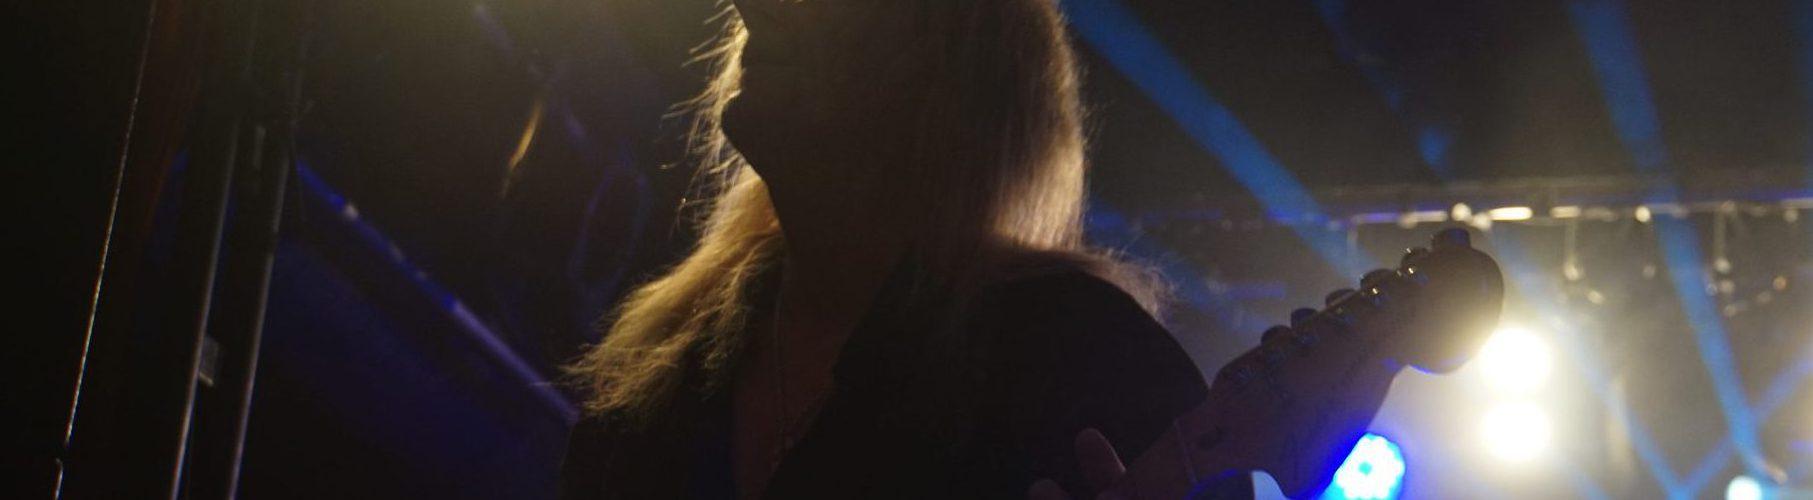 FOTOSTRECKE: Crystal Ball und Axel Rudi Pell im Colos-Saal